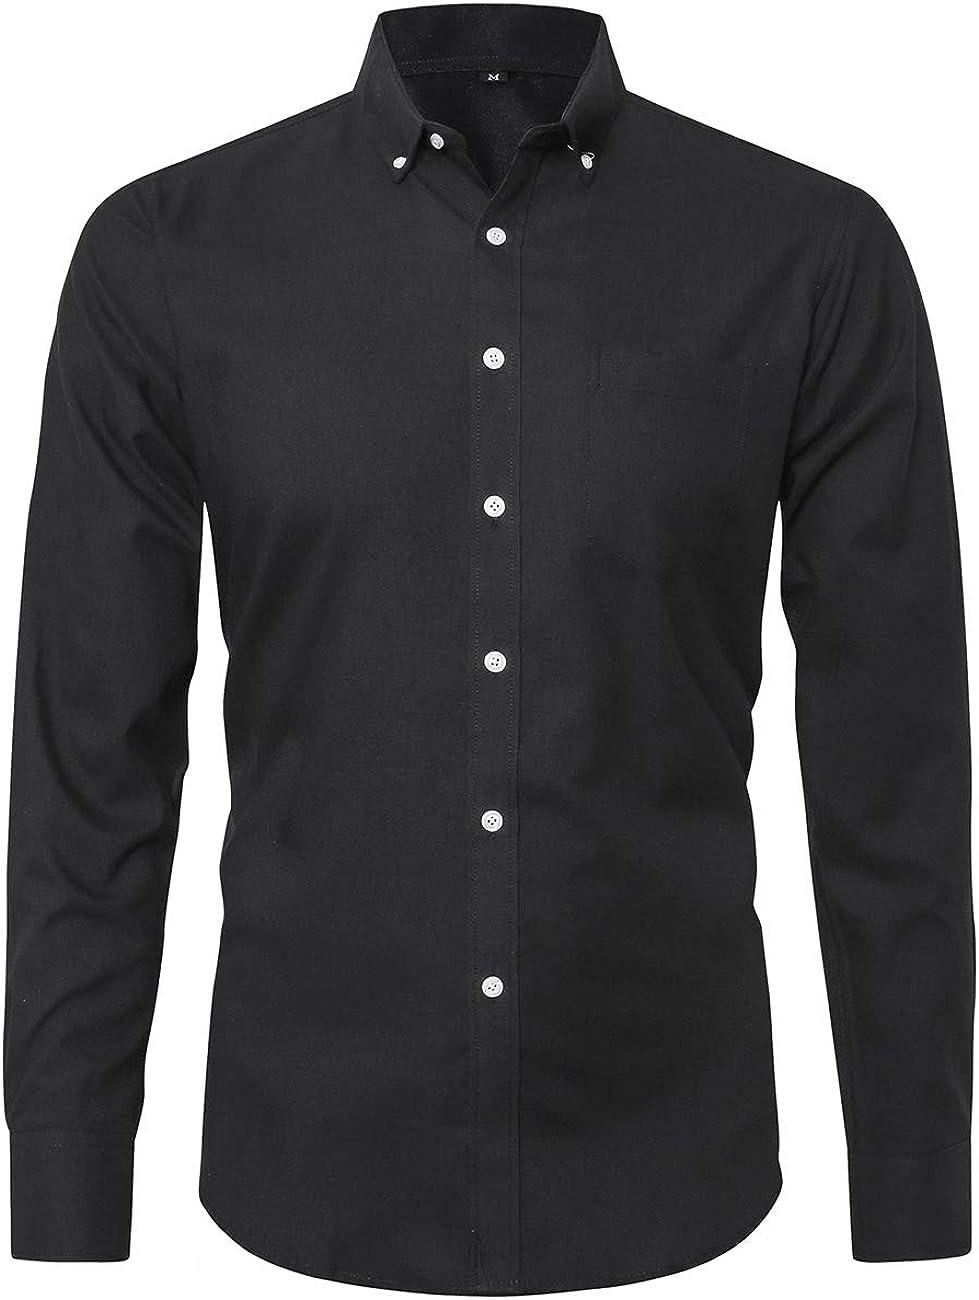 Dioufond Oxford Shirts for Men Cotton Mens Button Down Shirts